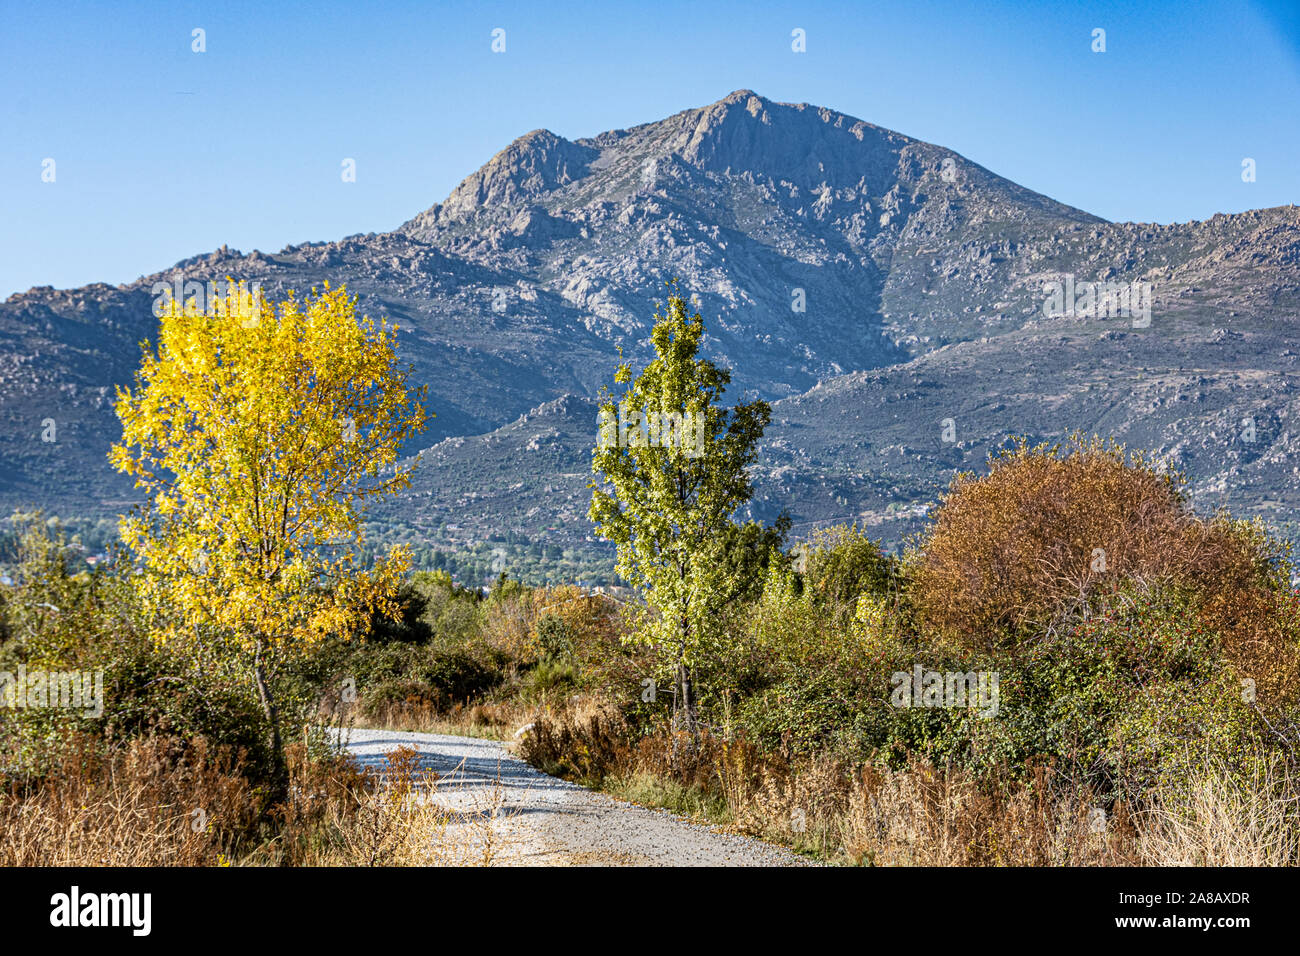 Trees with fall foliage in the Sierra de Guadarrama. madrid Spain Stock Photo